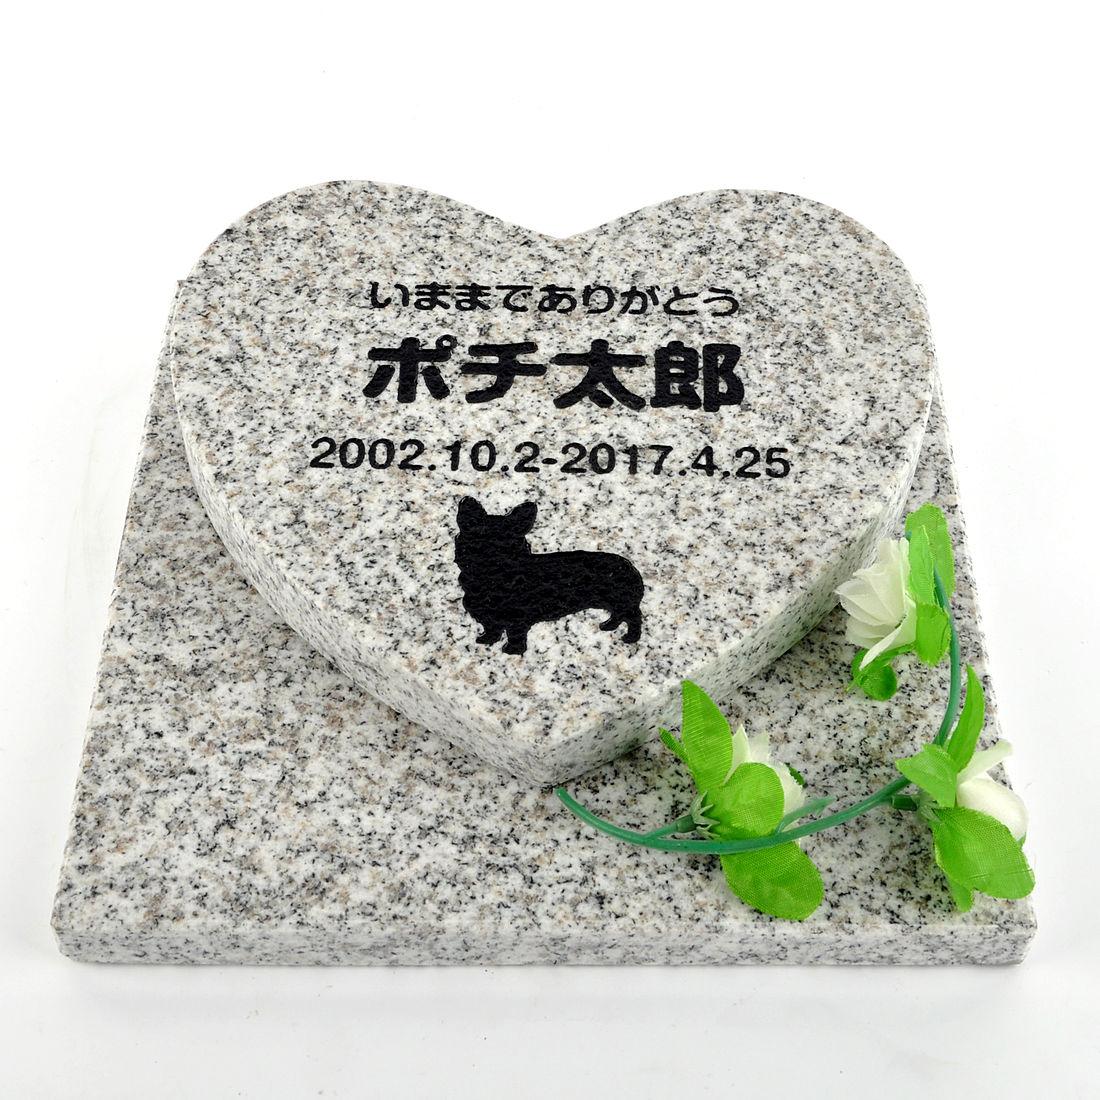 Pet&Love. ペットのお墓 天然石製 セット型 御影石 グレー ハート  【HLS_DU】【楽ギフ_名入れ】 attr131attr ctgr2ctgr sml3sml+ctgr2ctgr DOG